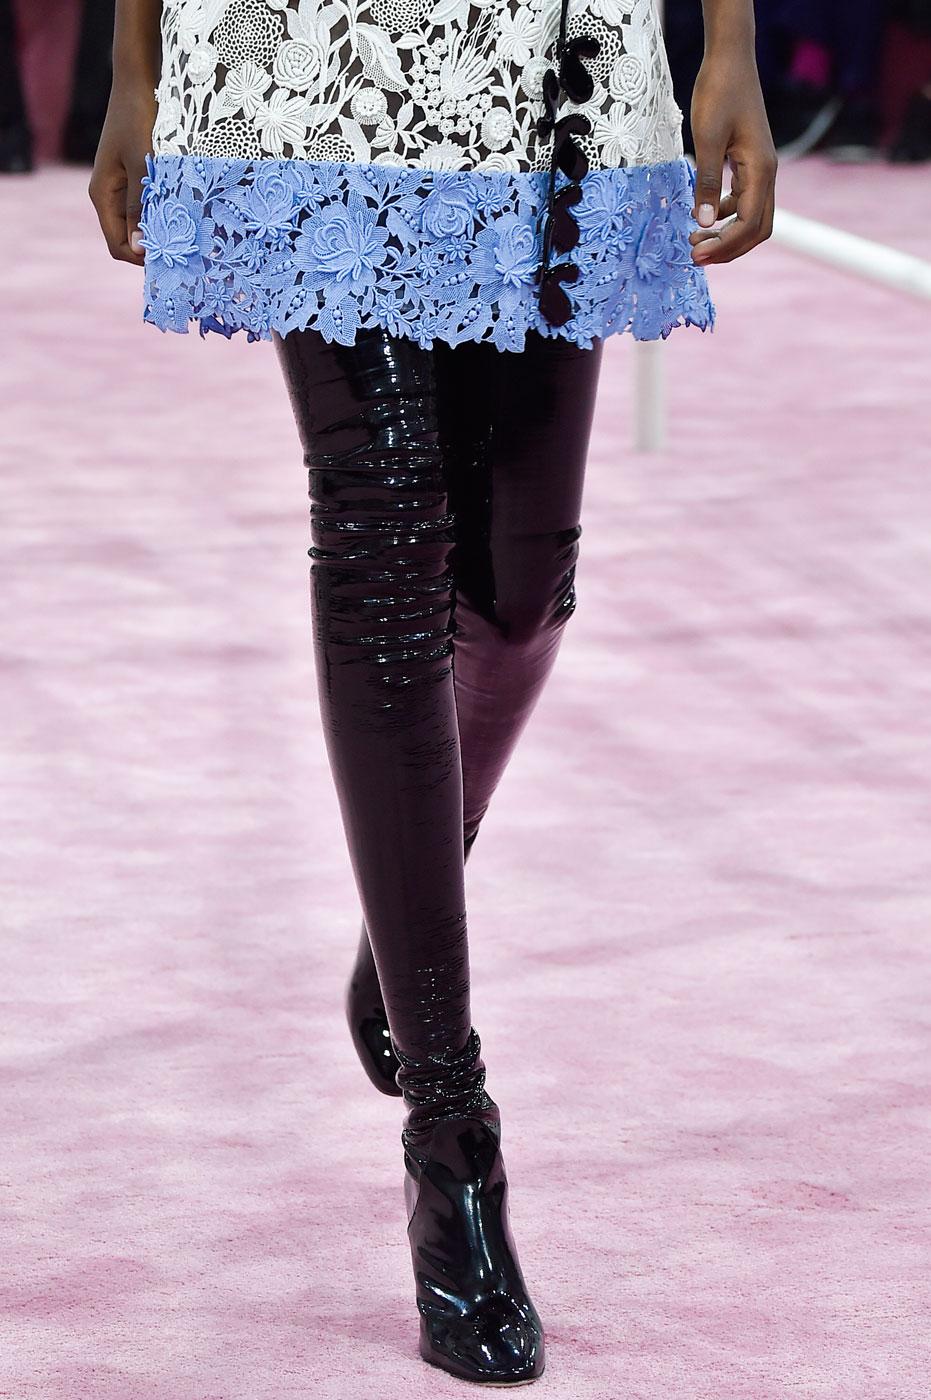 Christian-Dior-fashion-runway-show-close-ups-haute-couture-paris-spring-summer-2015-the-impression-091